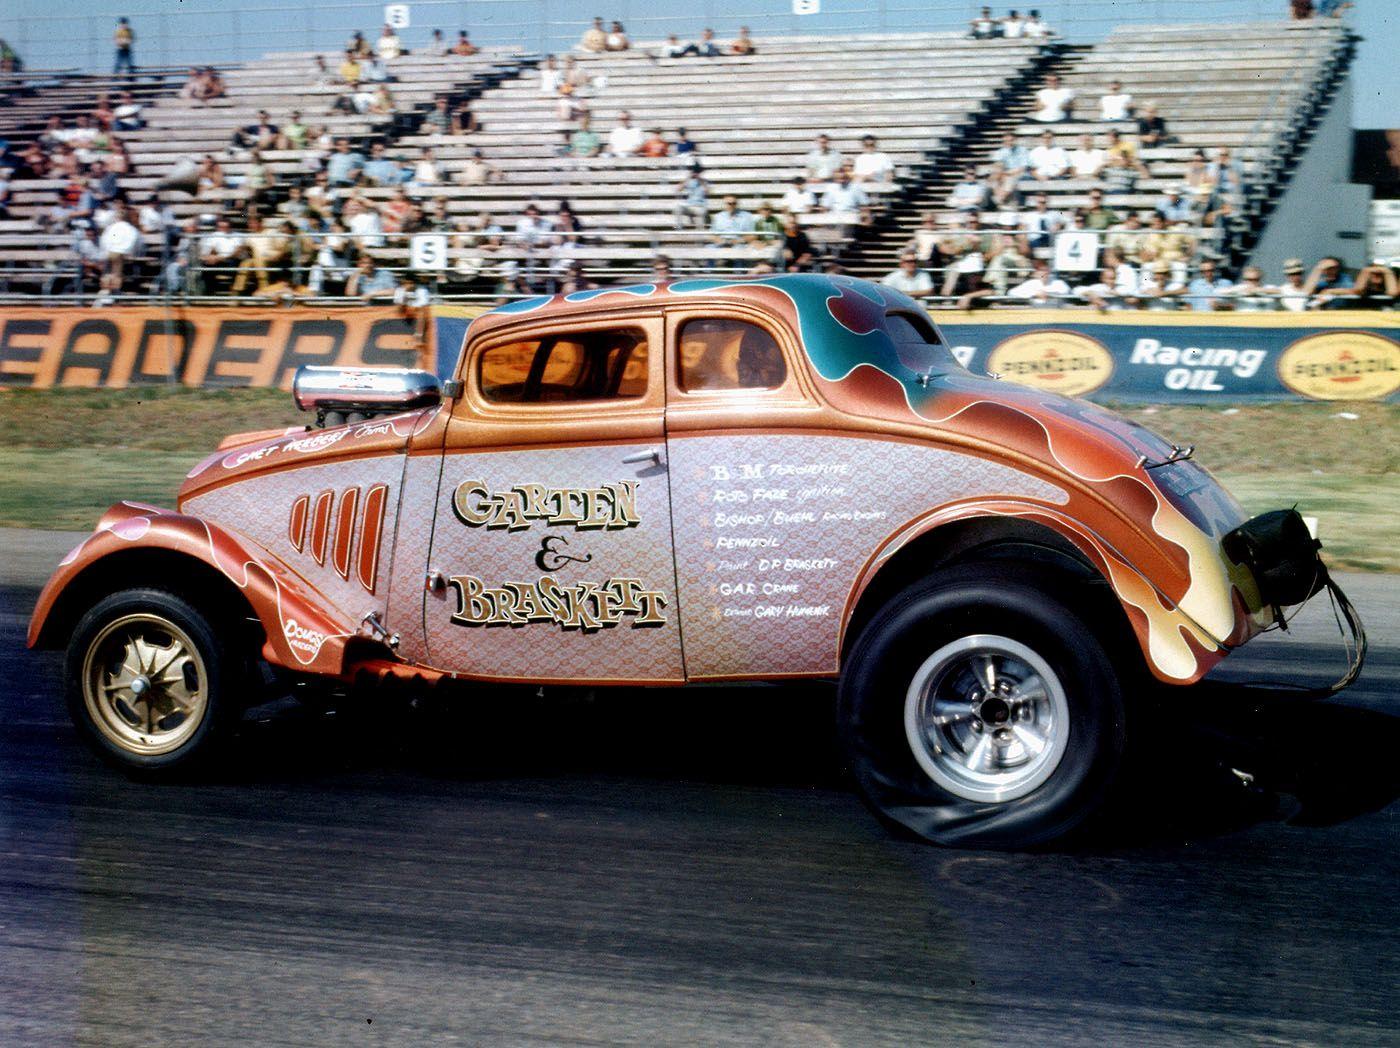 33 Willys Gasser Garten Braskett Drag Racing Cars Drag Cars Vintage Race Car